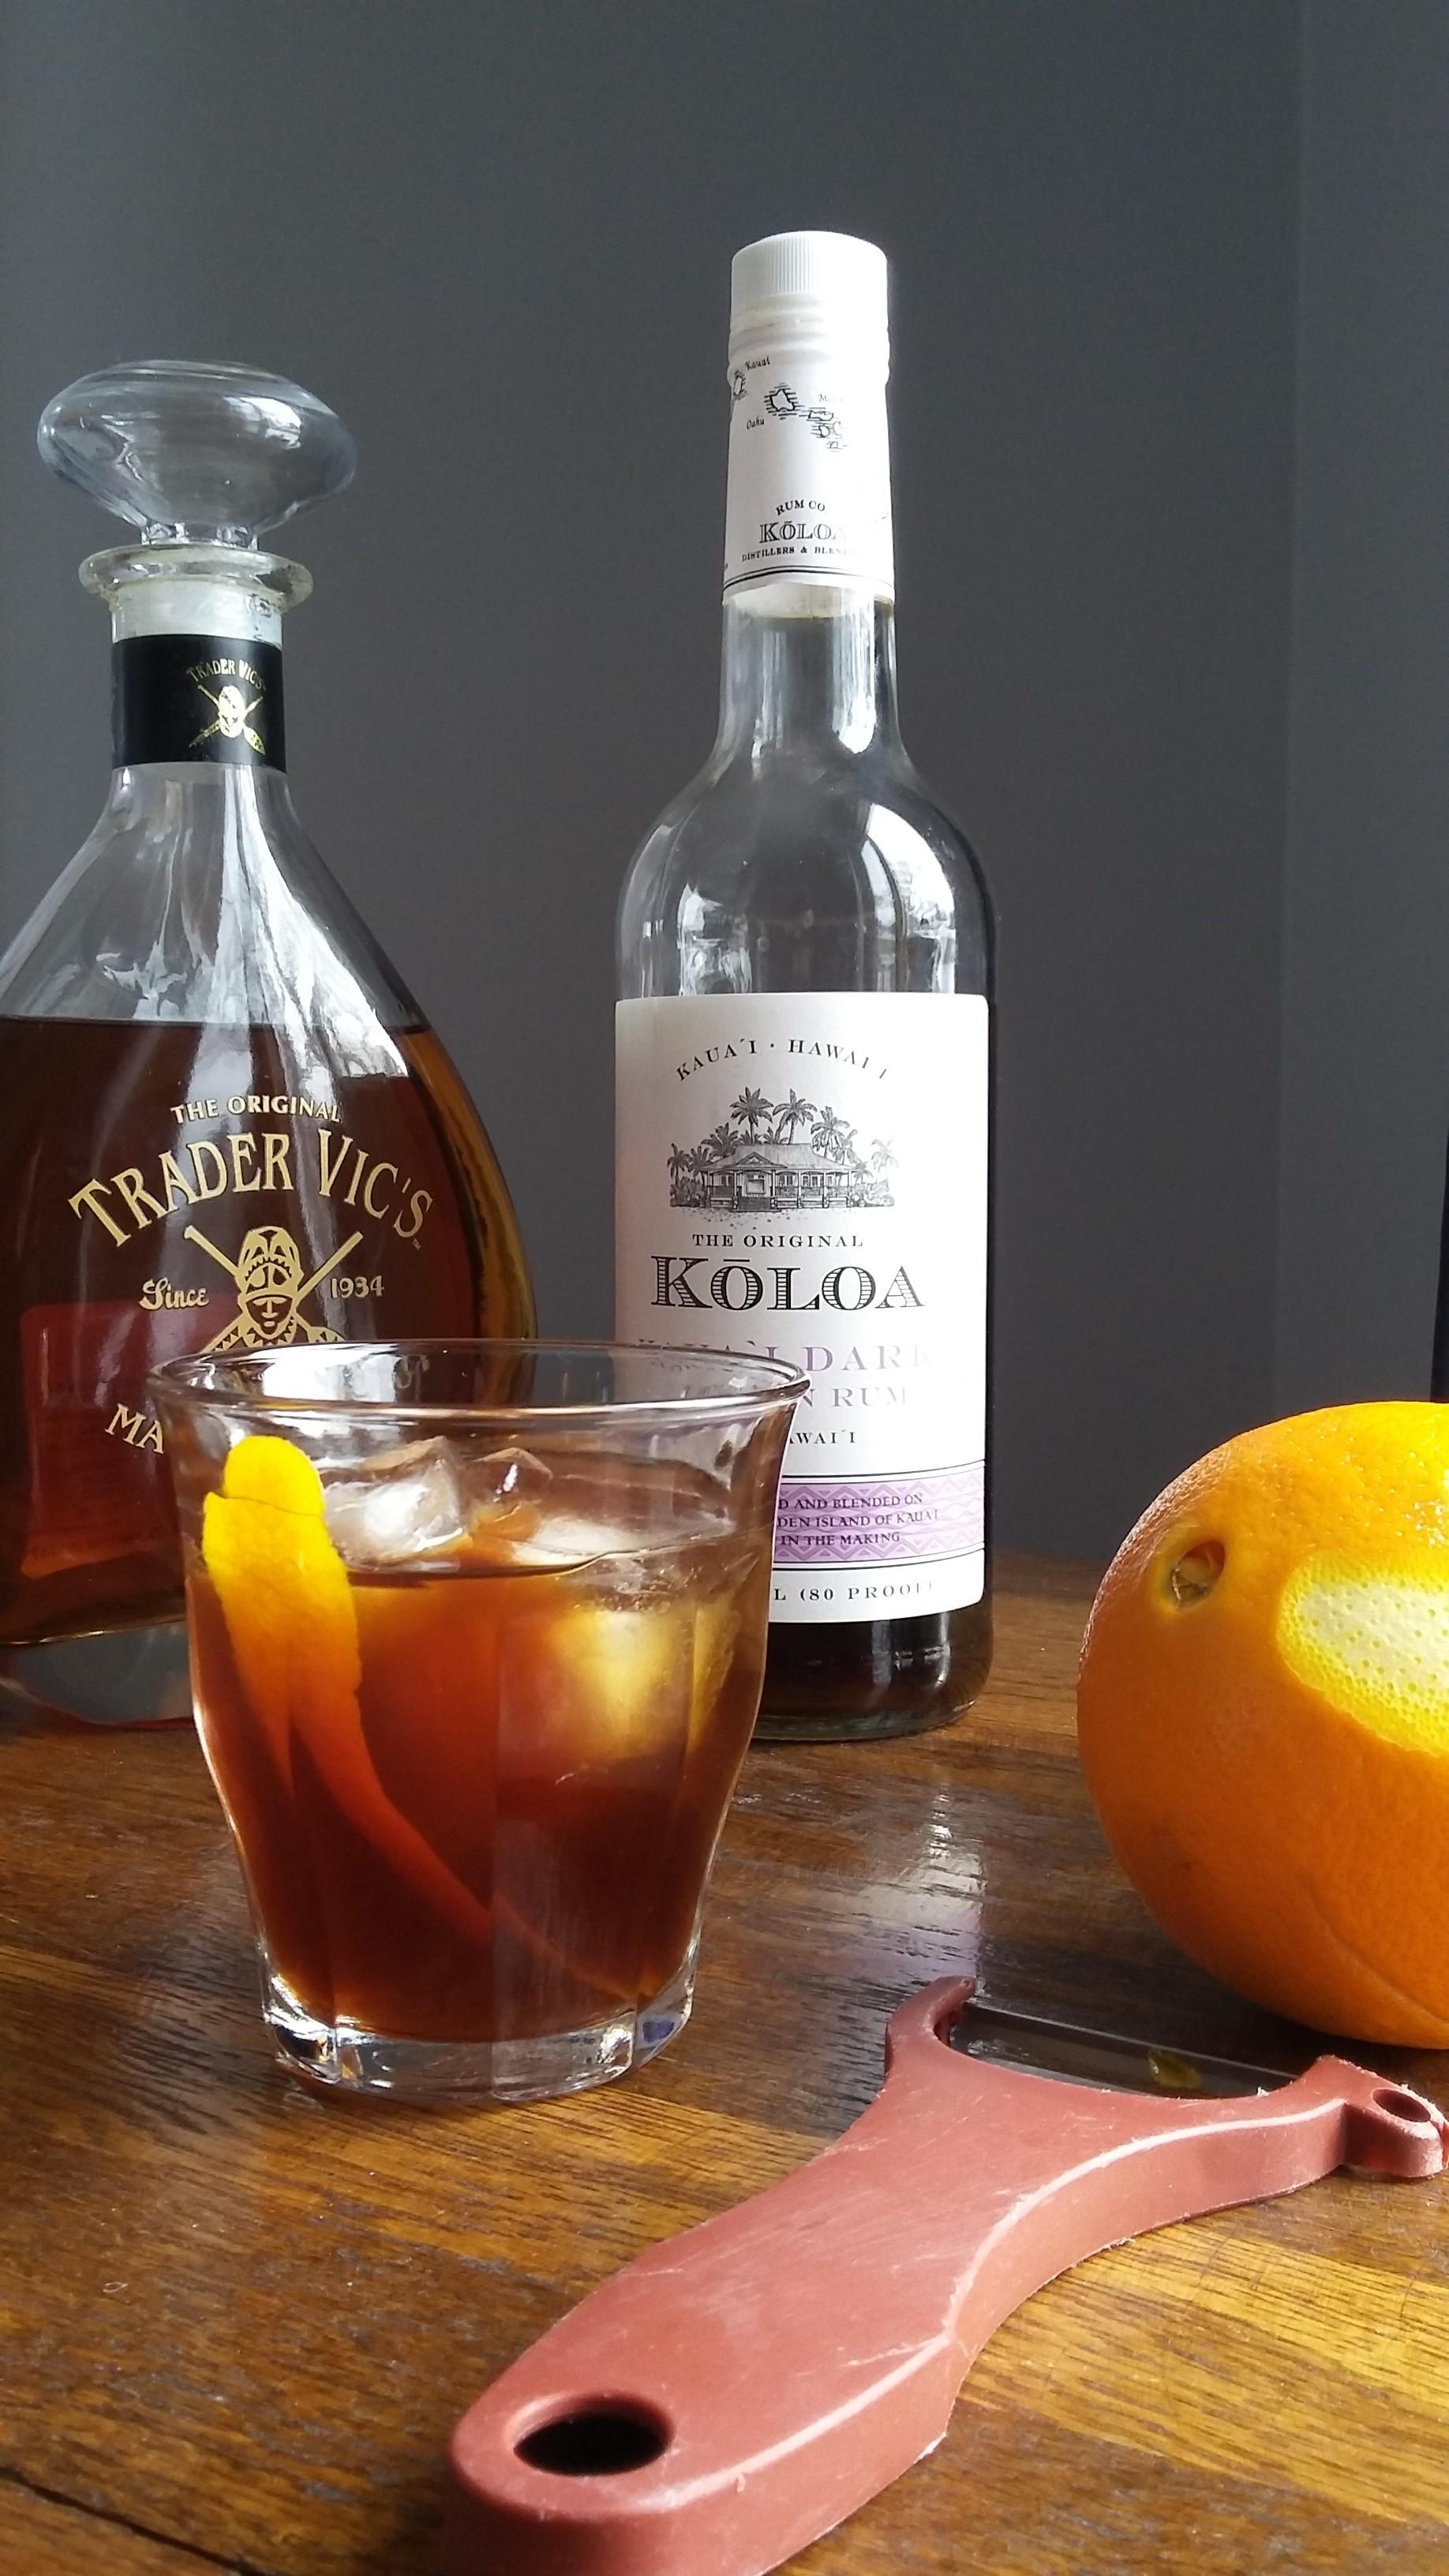 A Kona Breeze cocktail, with Koloa dark rum and Trader Vic's macadamia nut liqueur.